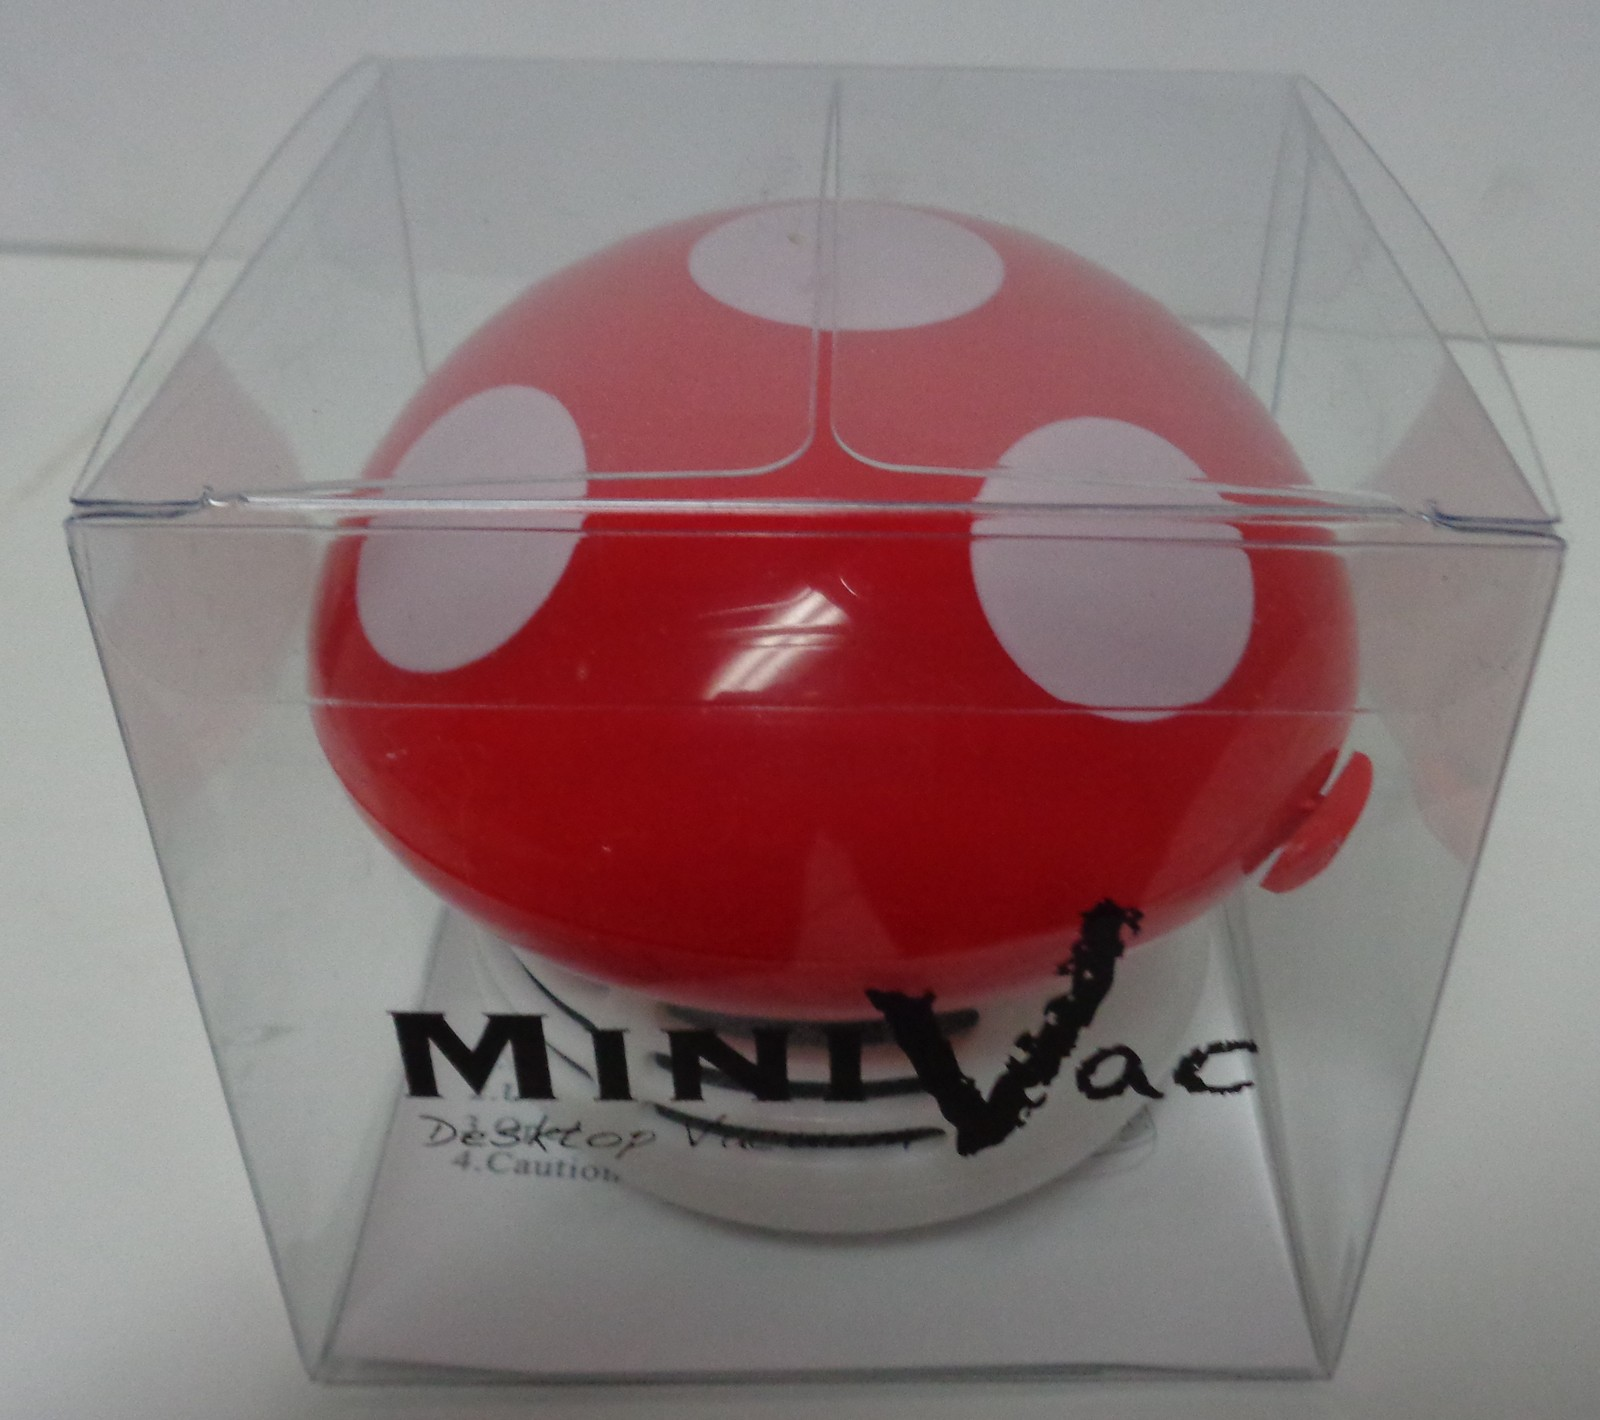 Red Mushroom Mini Vac Table Top NIB Battery Powered